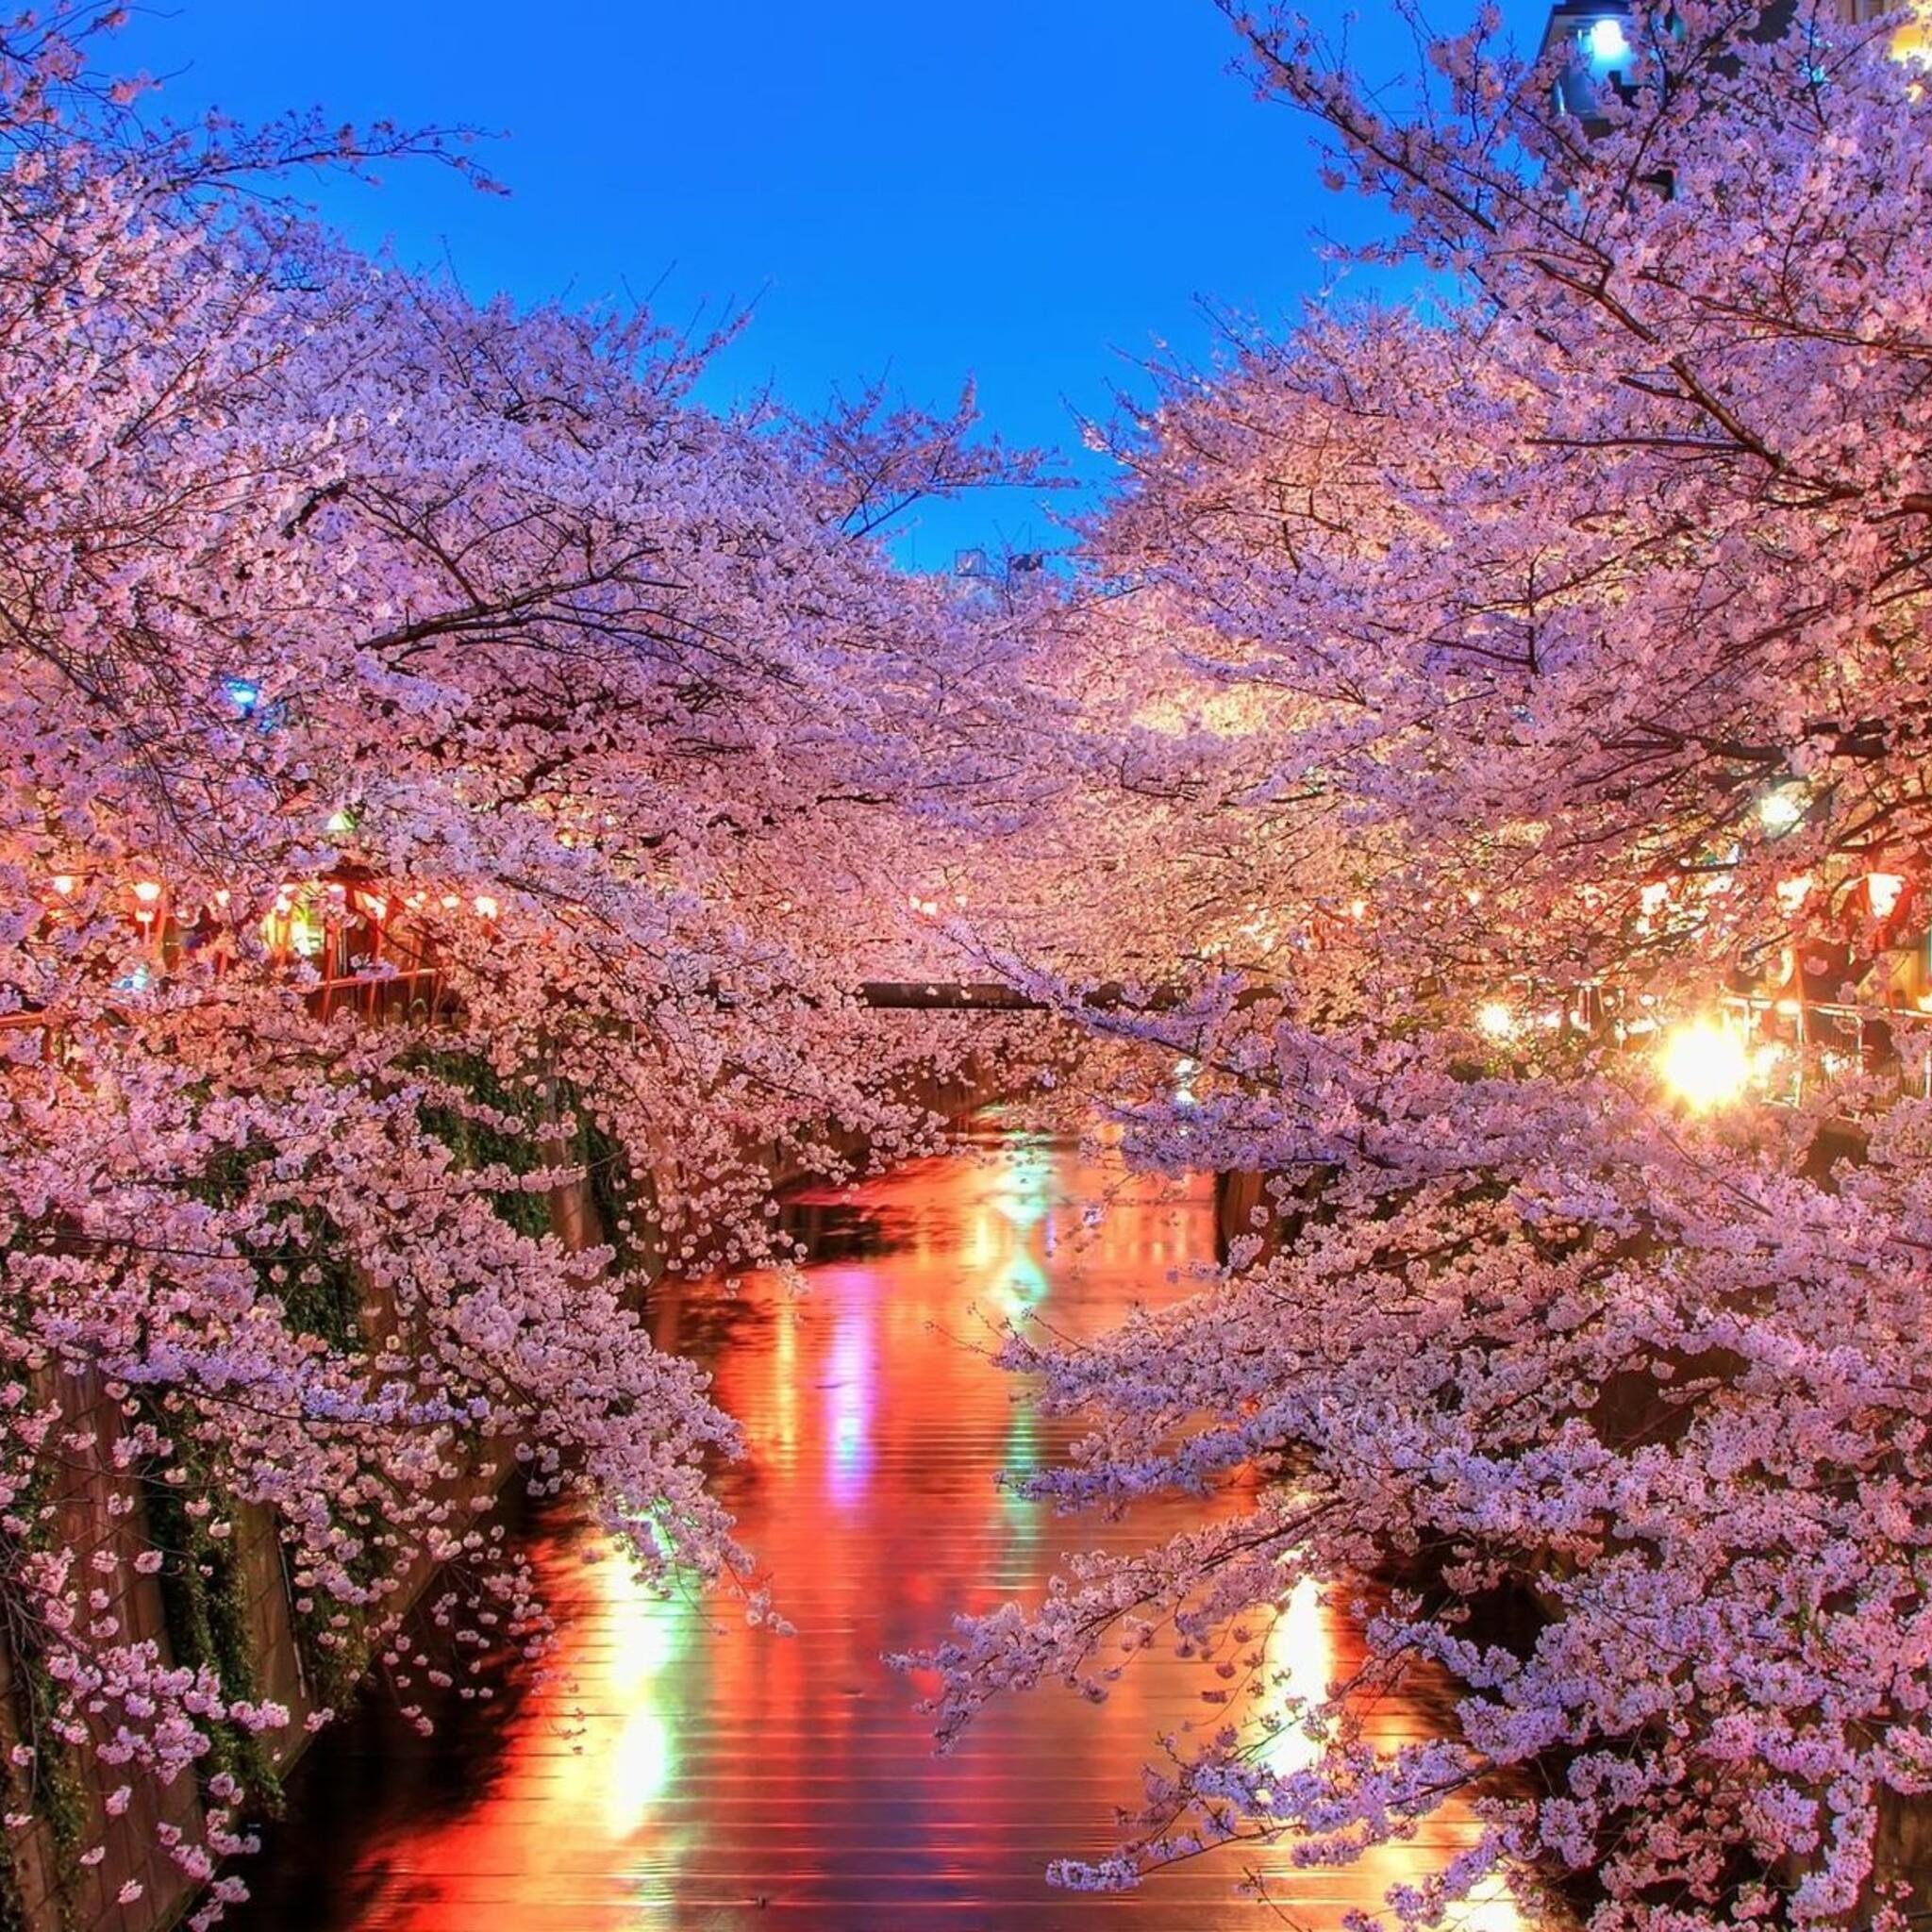 2048x2048 Cherry Blossom Trees Ipad Air HD 4k Wallpapers ...